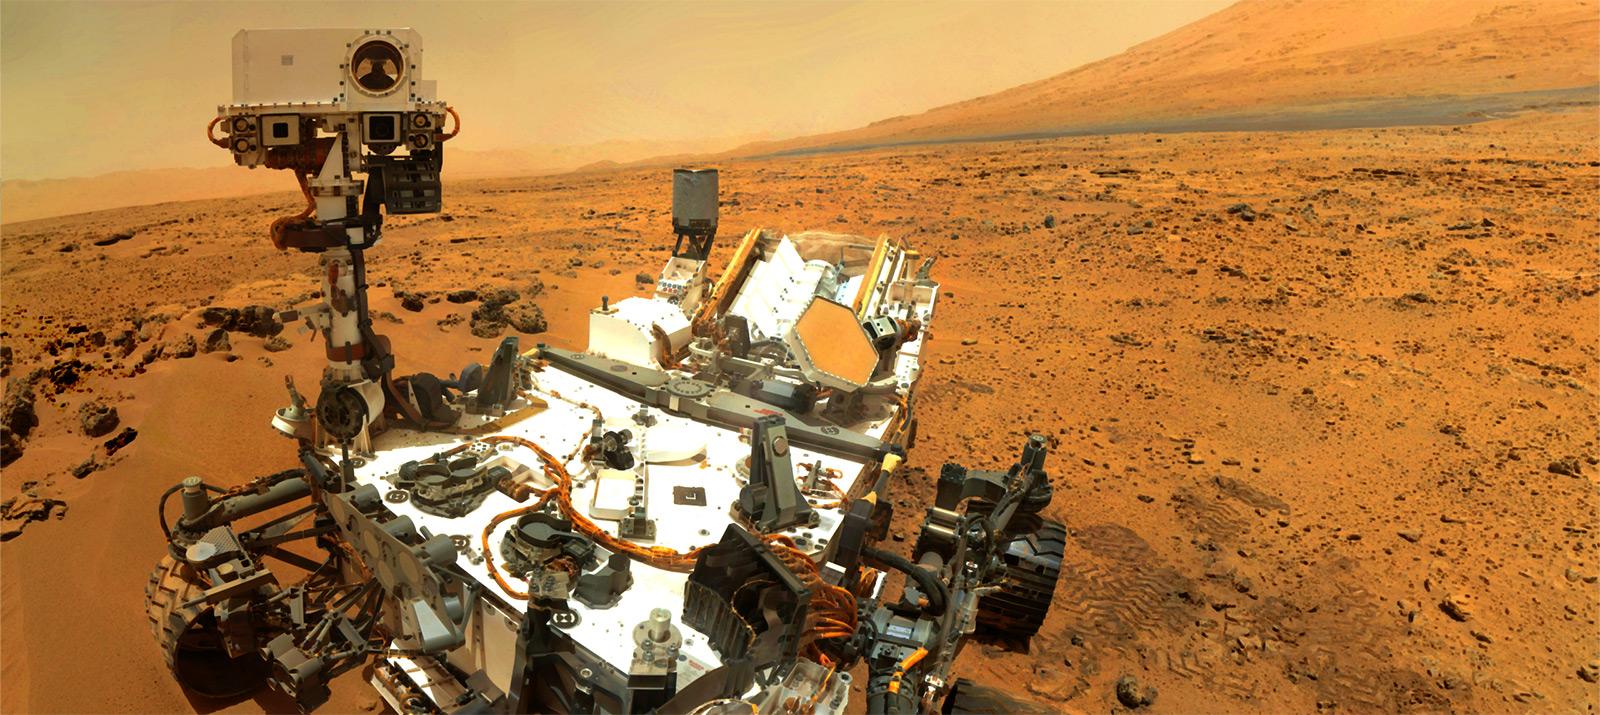 nasa explorer mars - 1000×562